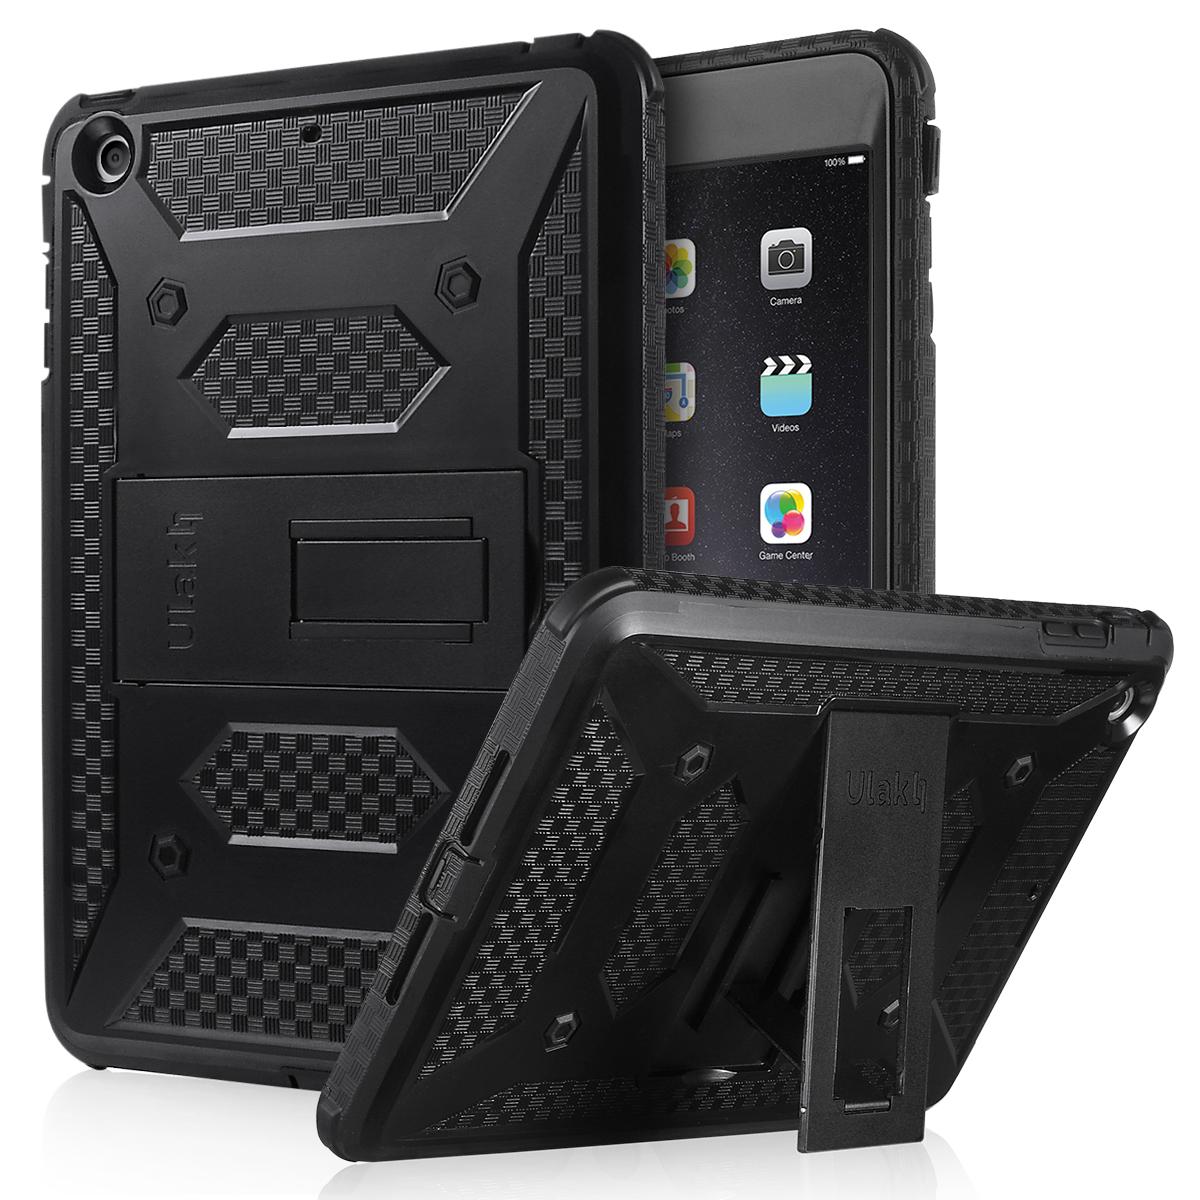 Heavy Duty Hybrid : Shockproof heavy duty hybrid hard case cover with